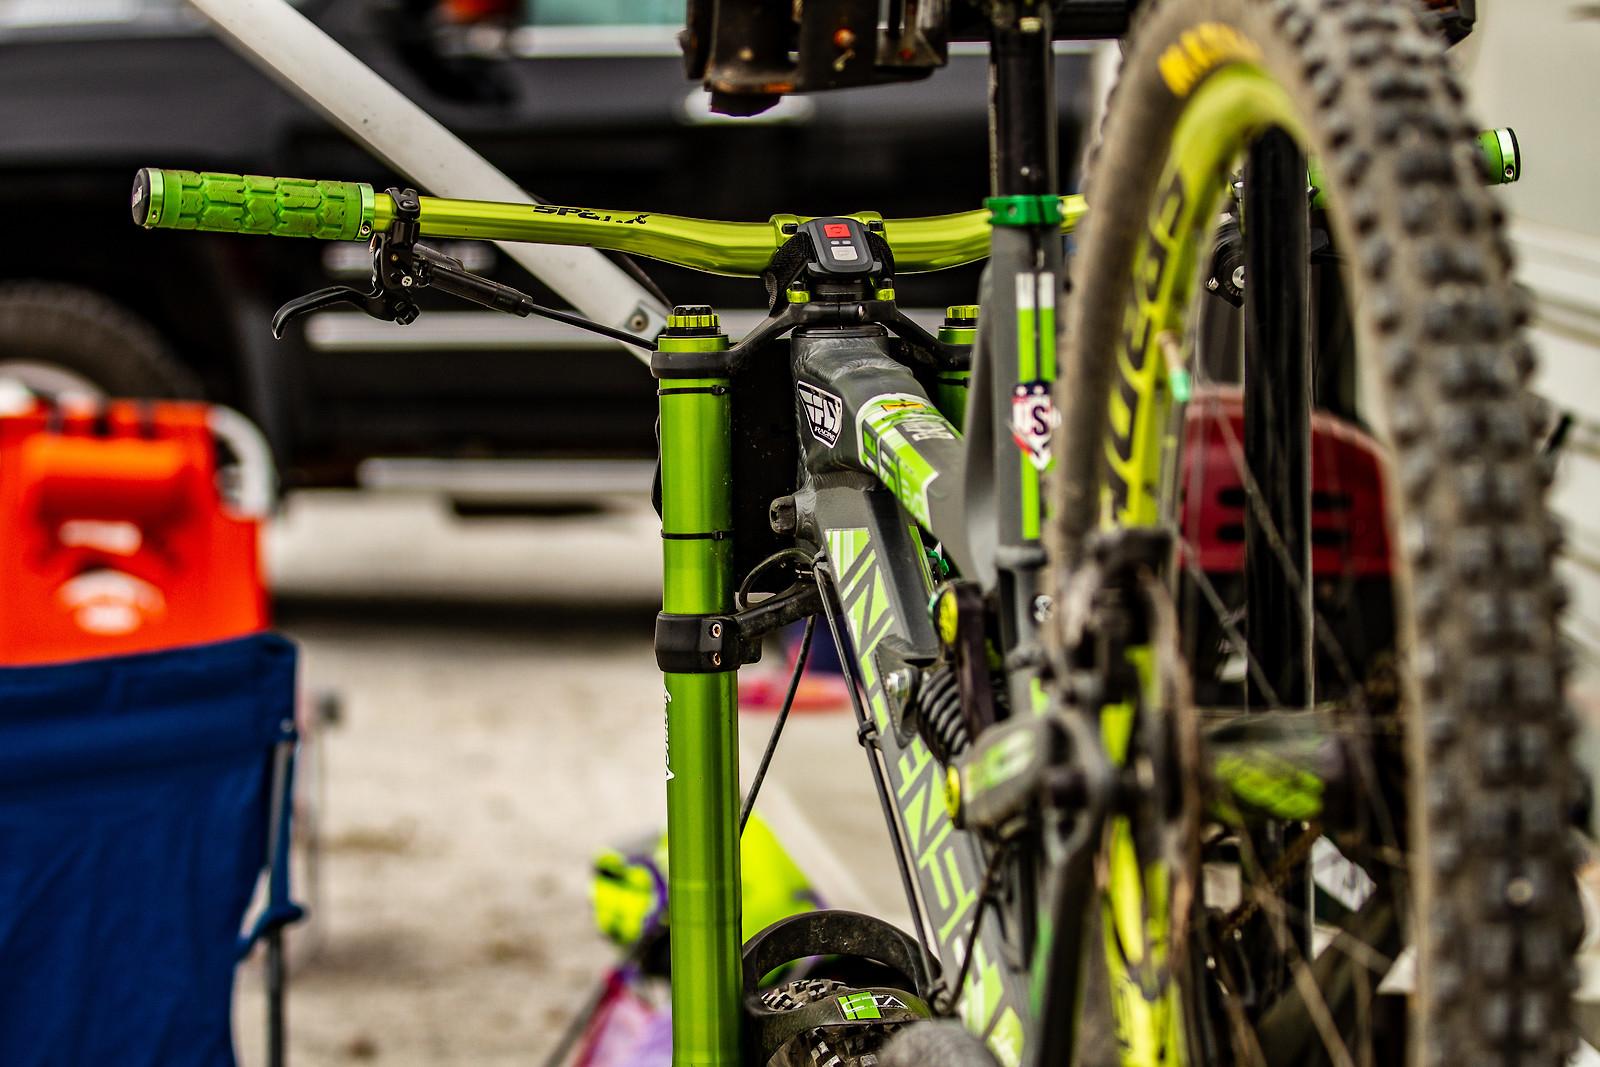 2015 Intense 951 EVP - JackRice - Mountain Biking Pictures - Vital MTB